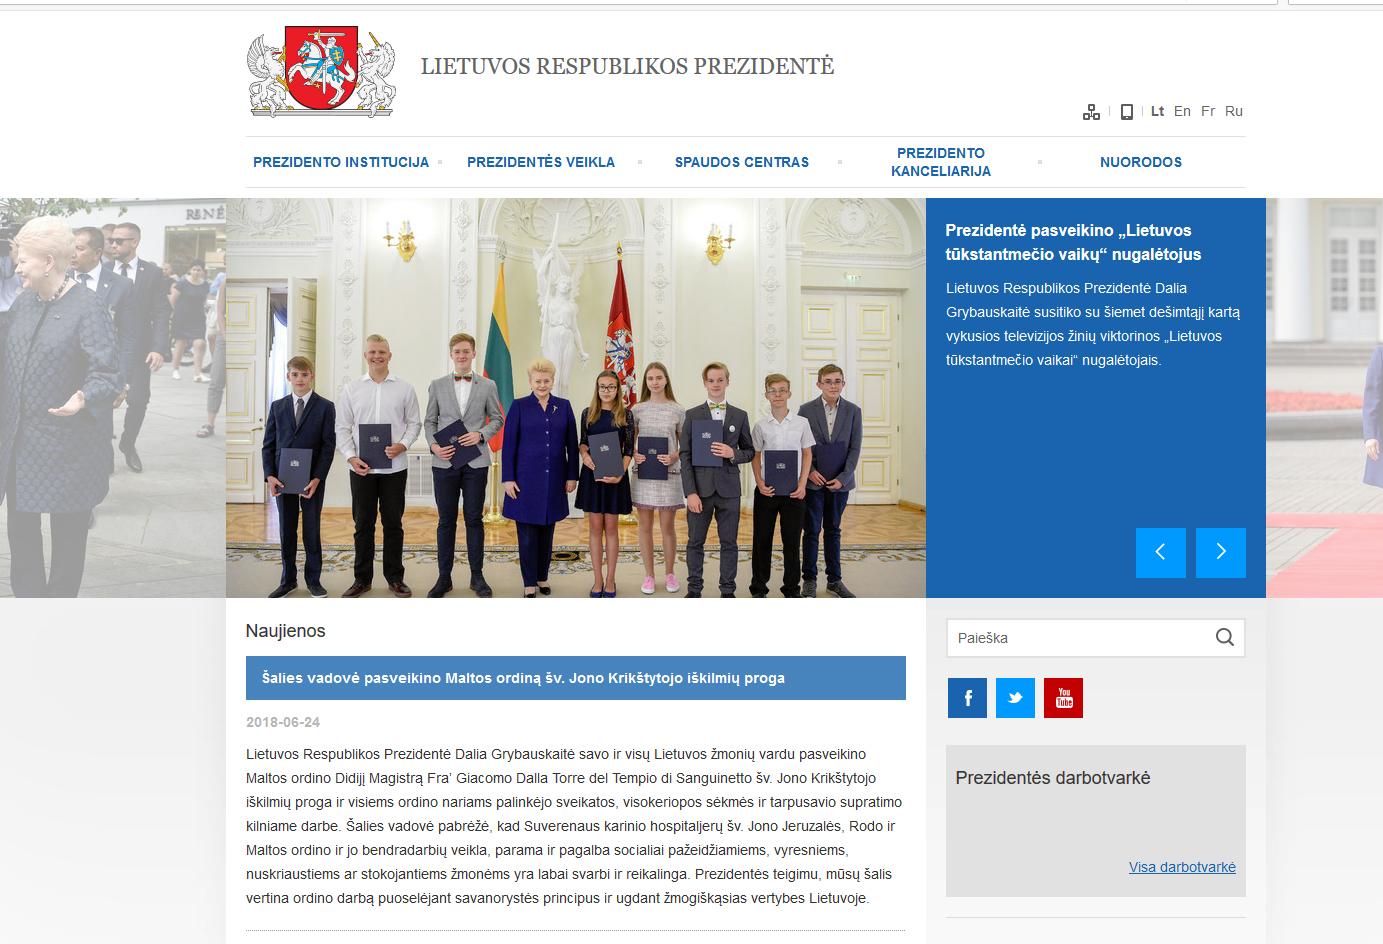 Lietuvos-prezidente-pasveikino-maltos-ordina-alkas-lt-nuotr